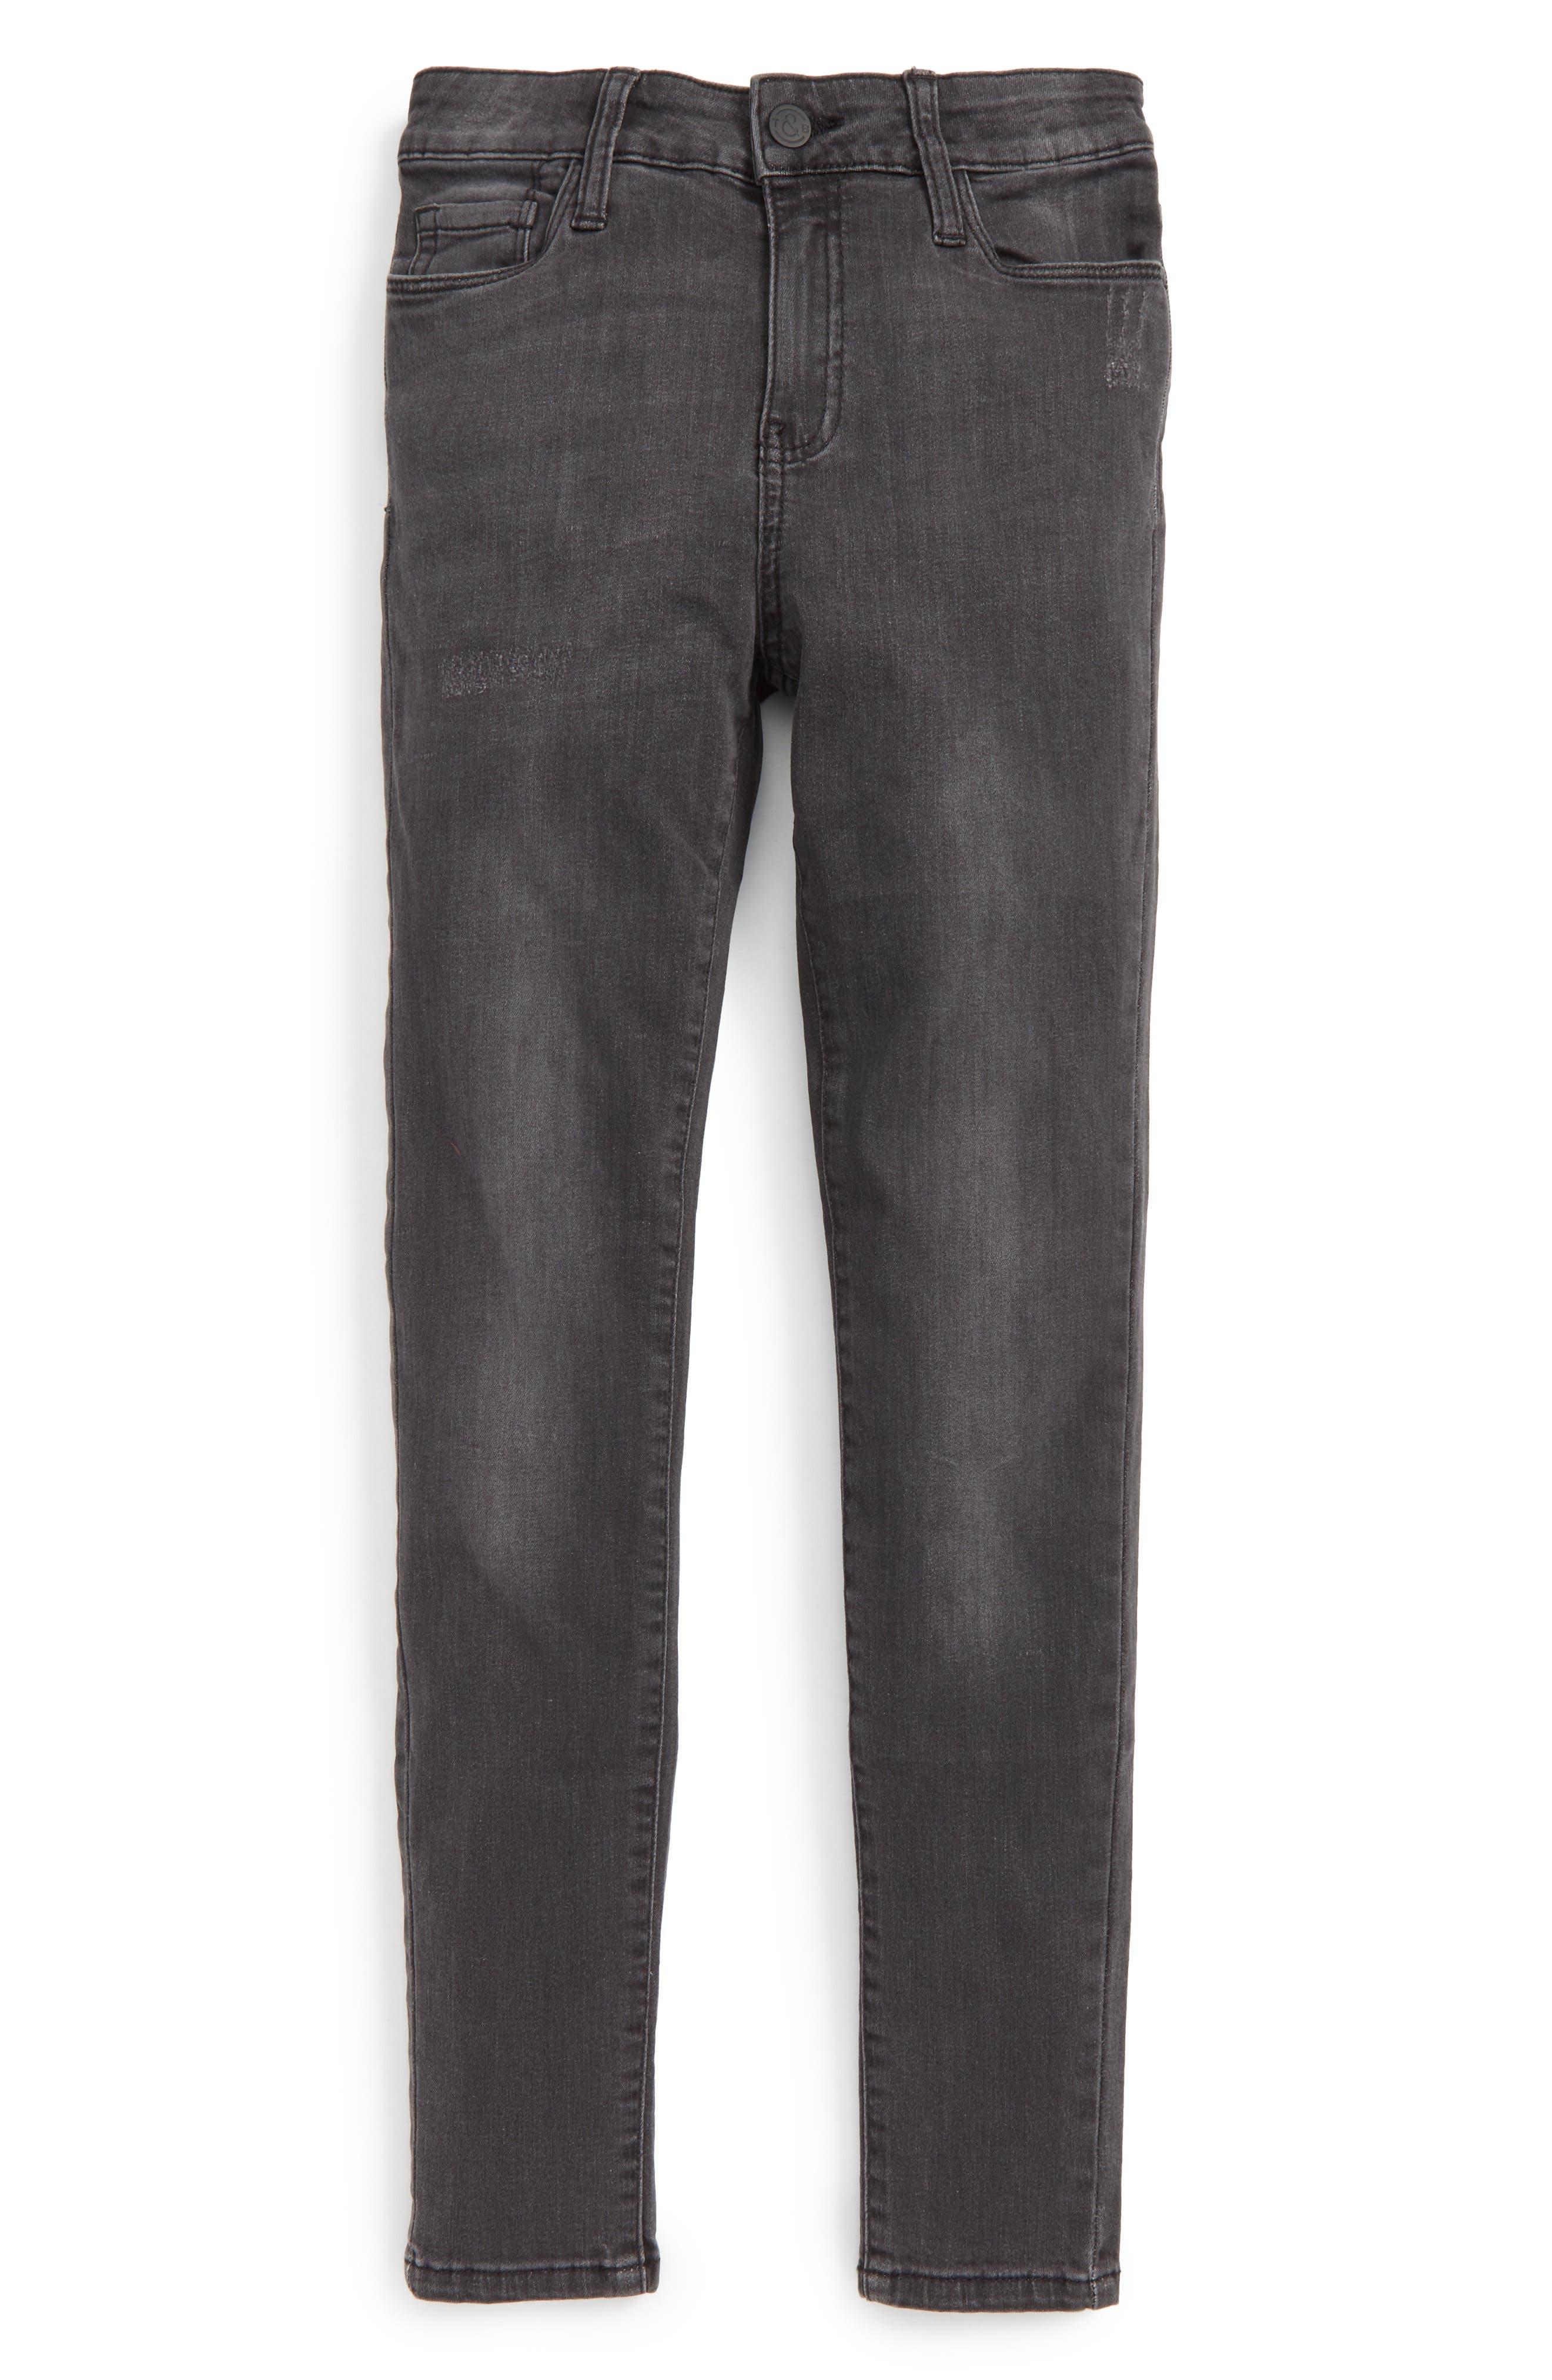 Skinny Jeans,                         Main,                         color, Washed Black